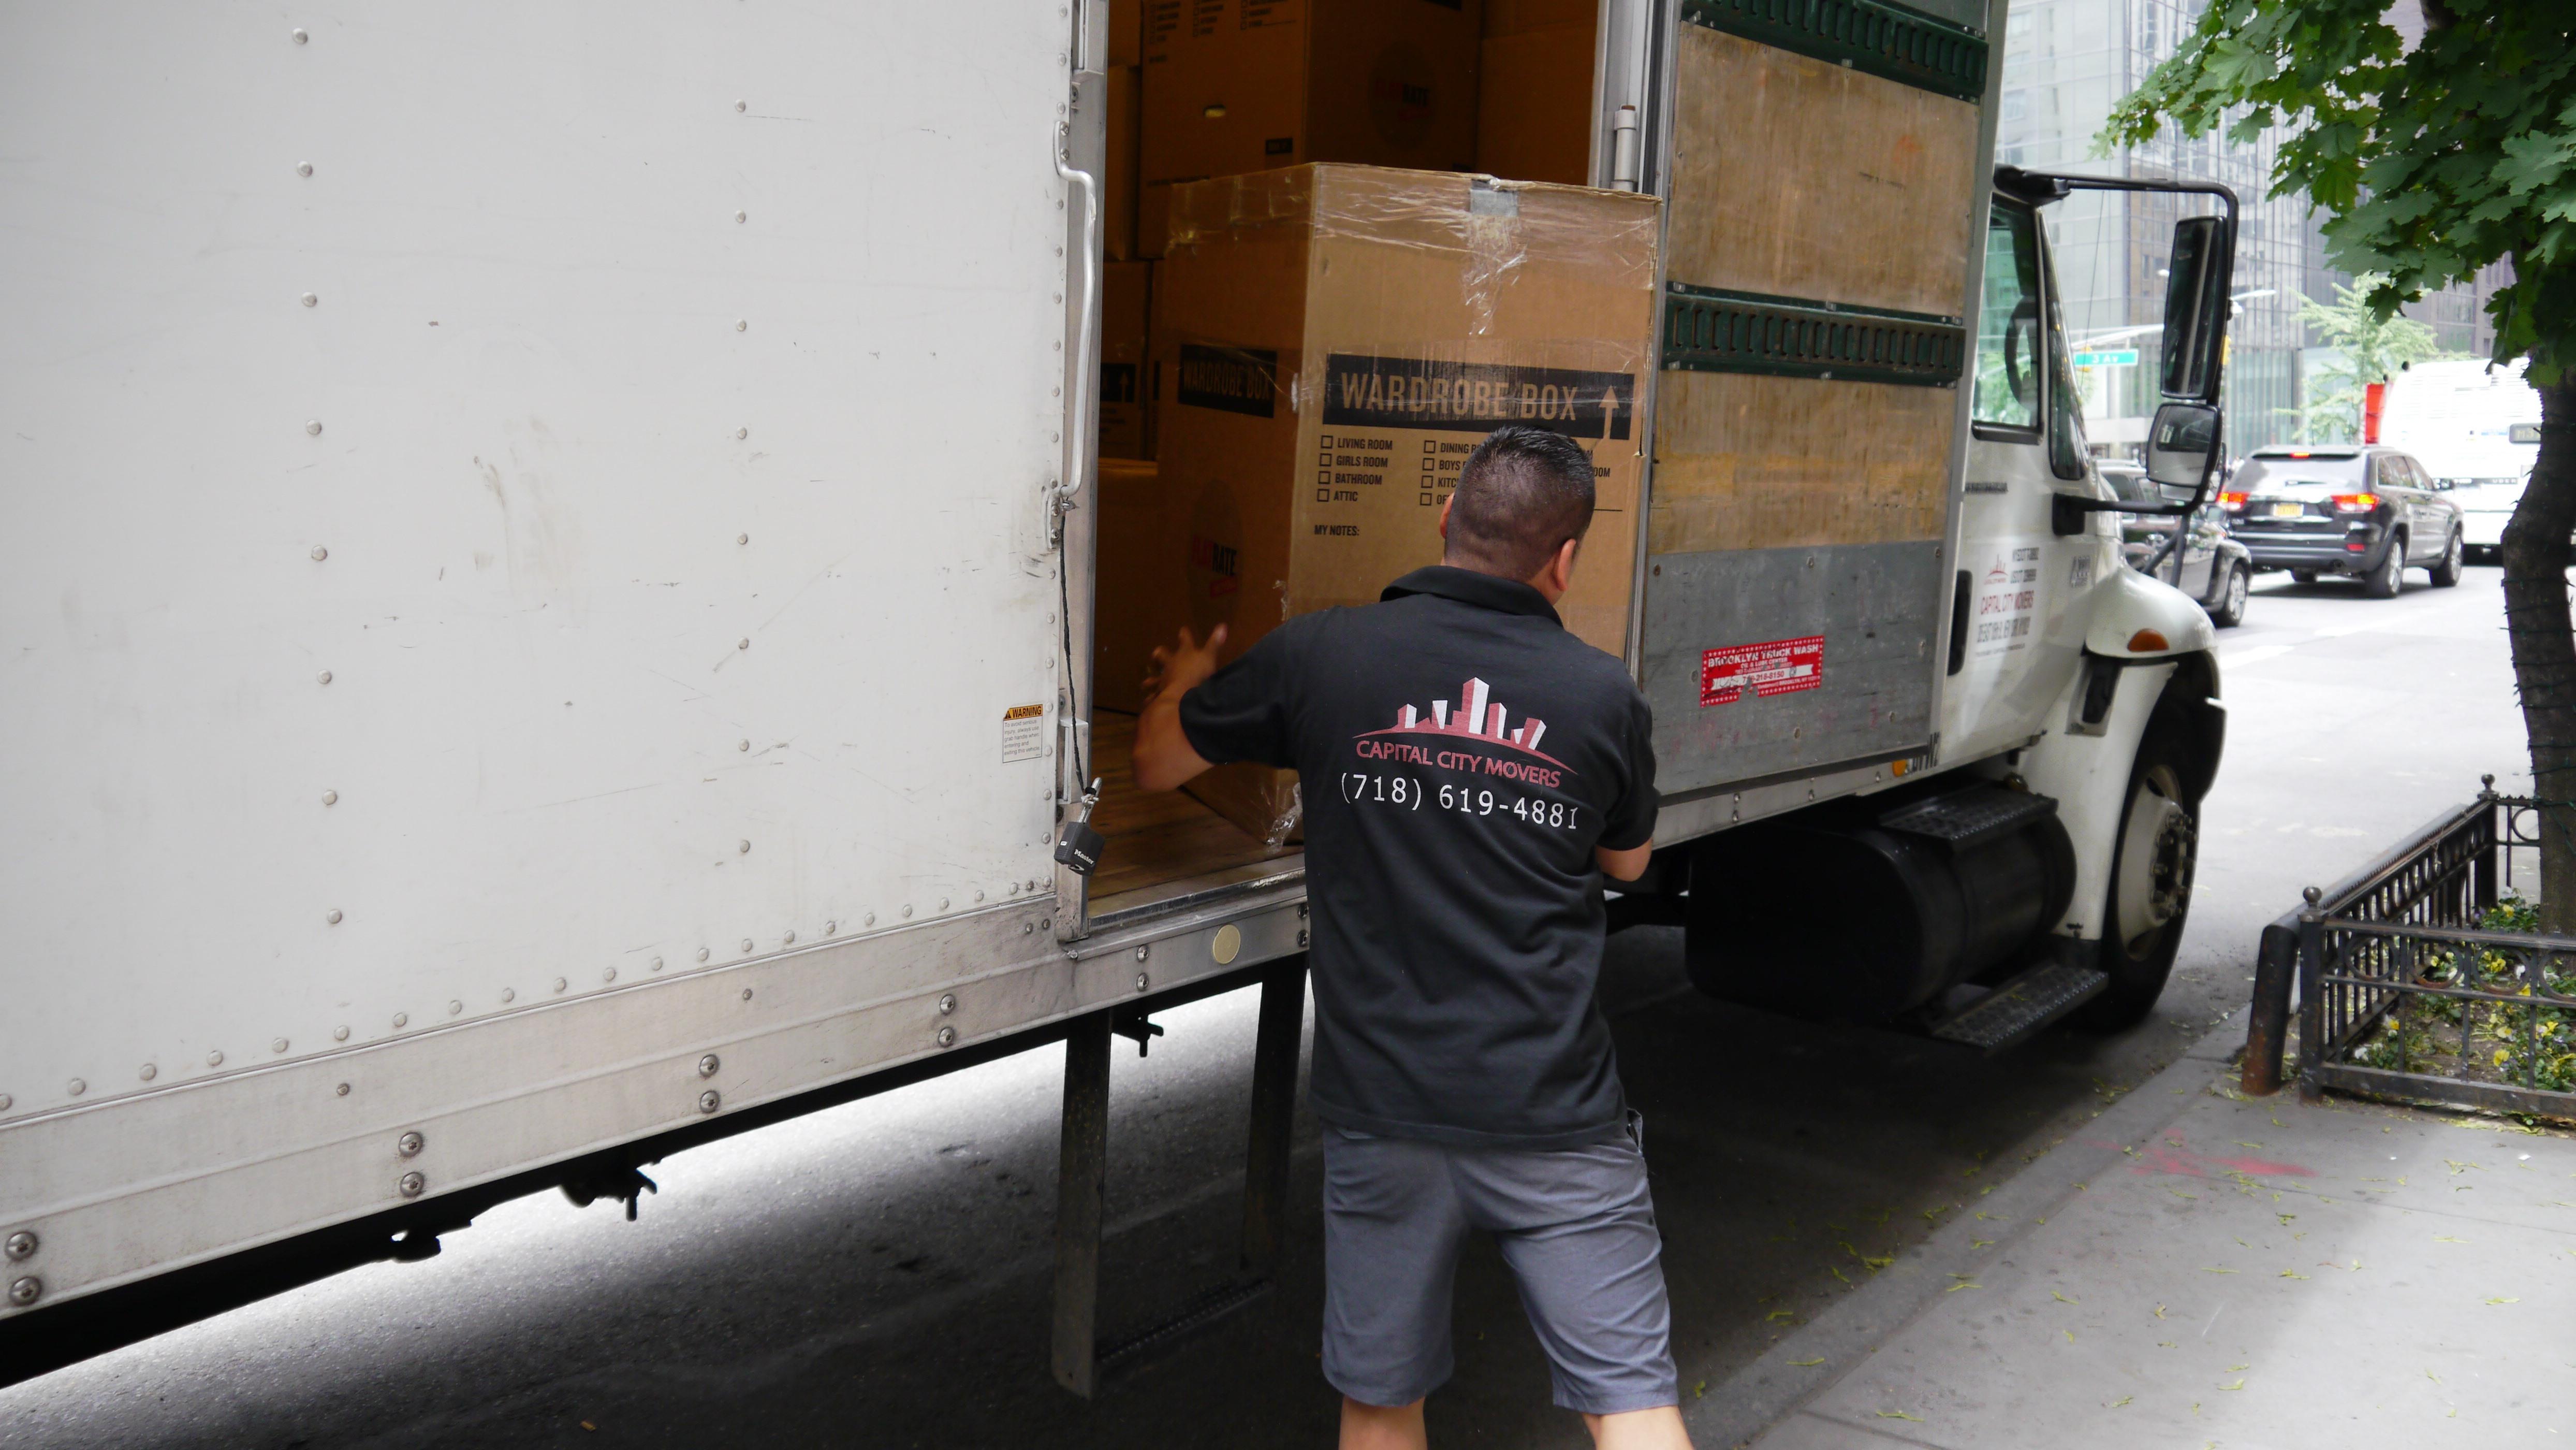 Capital City Movers NYC image 89